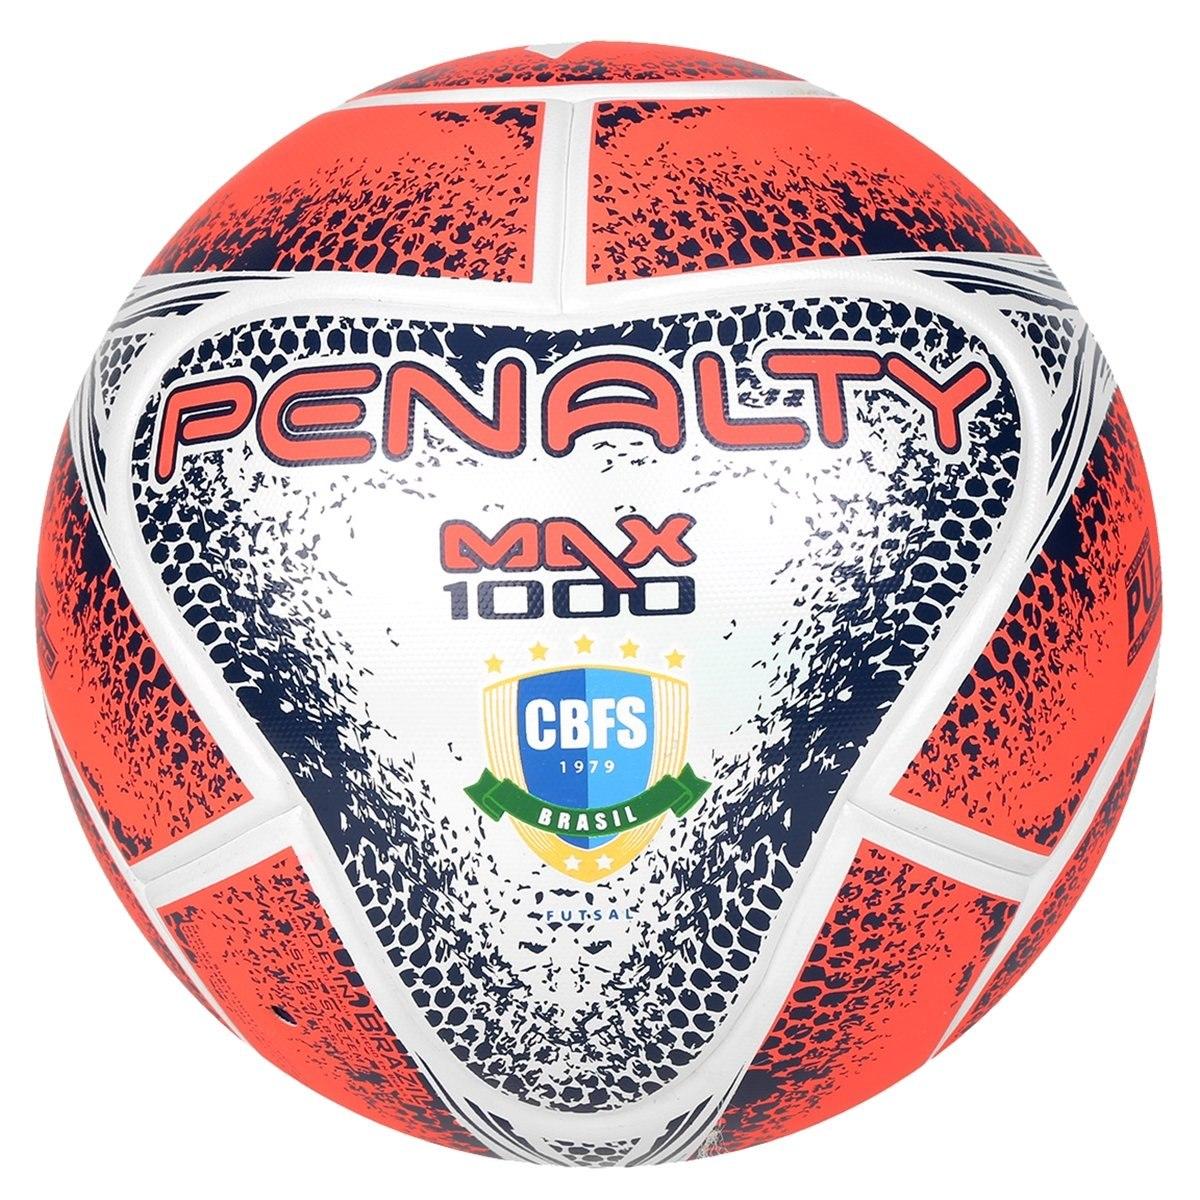 da83aaf97 Bola Futsal Penalty Max 1000 8